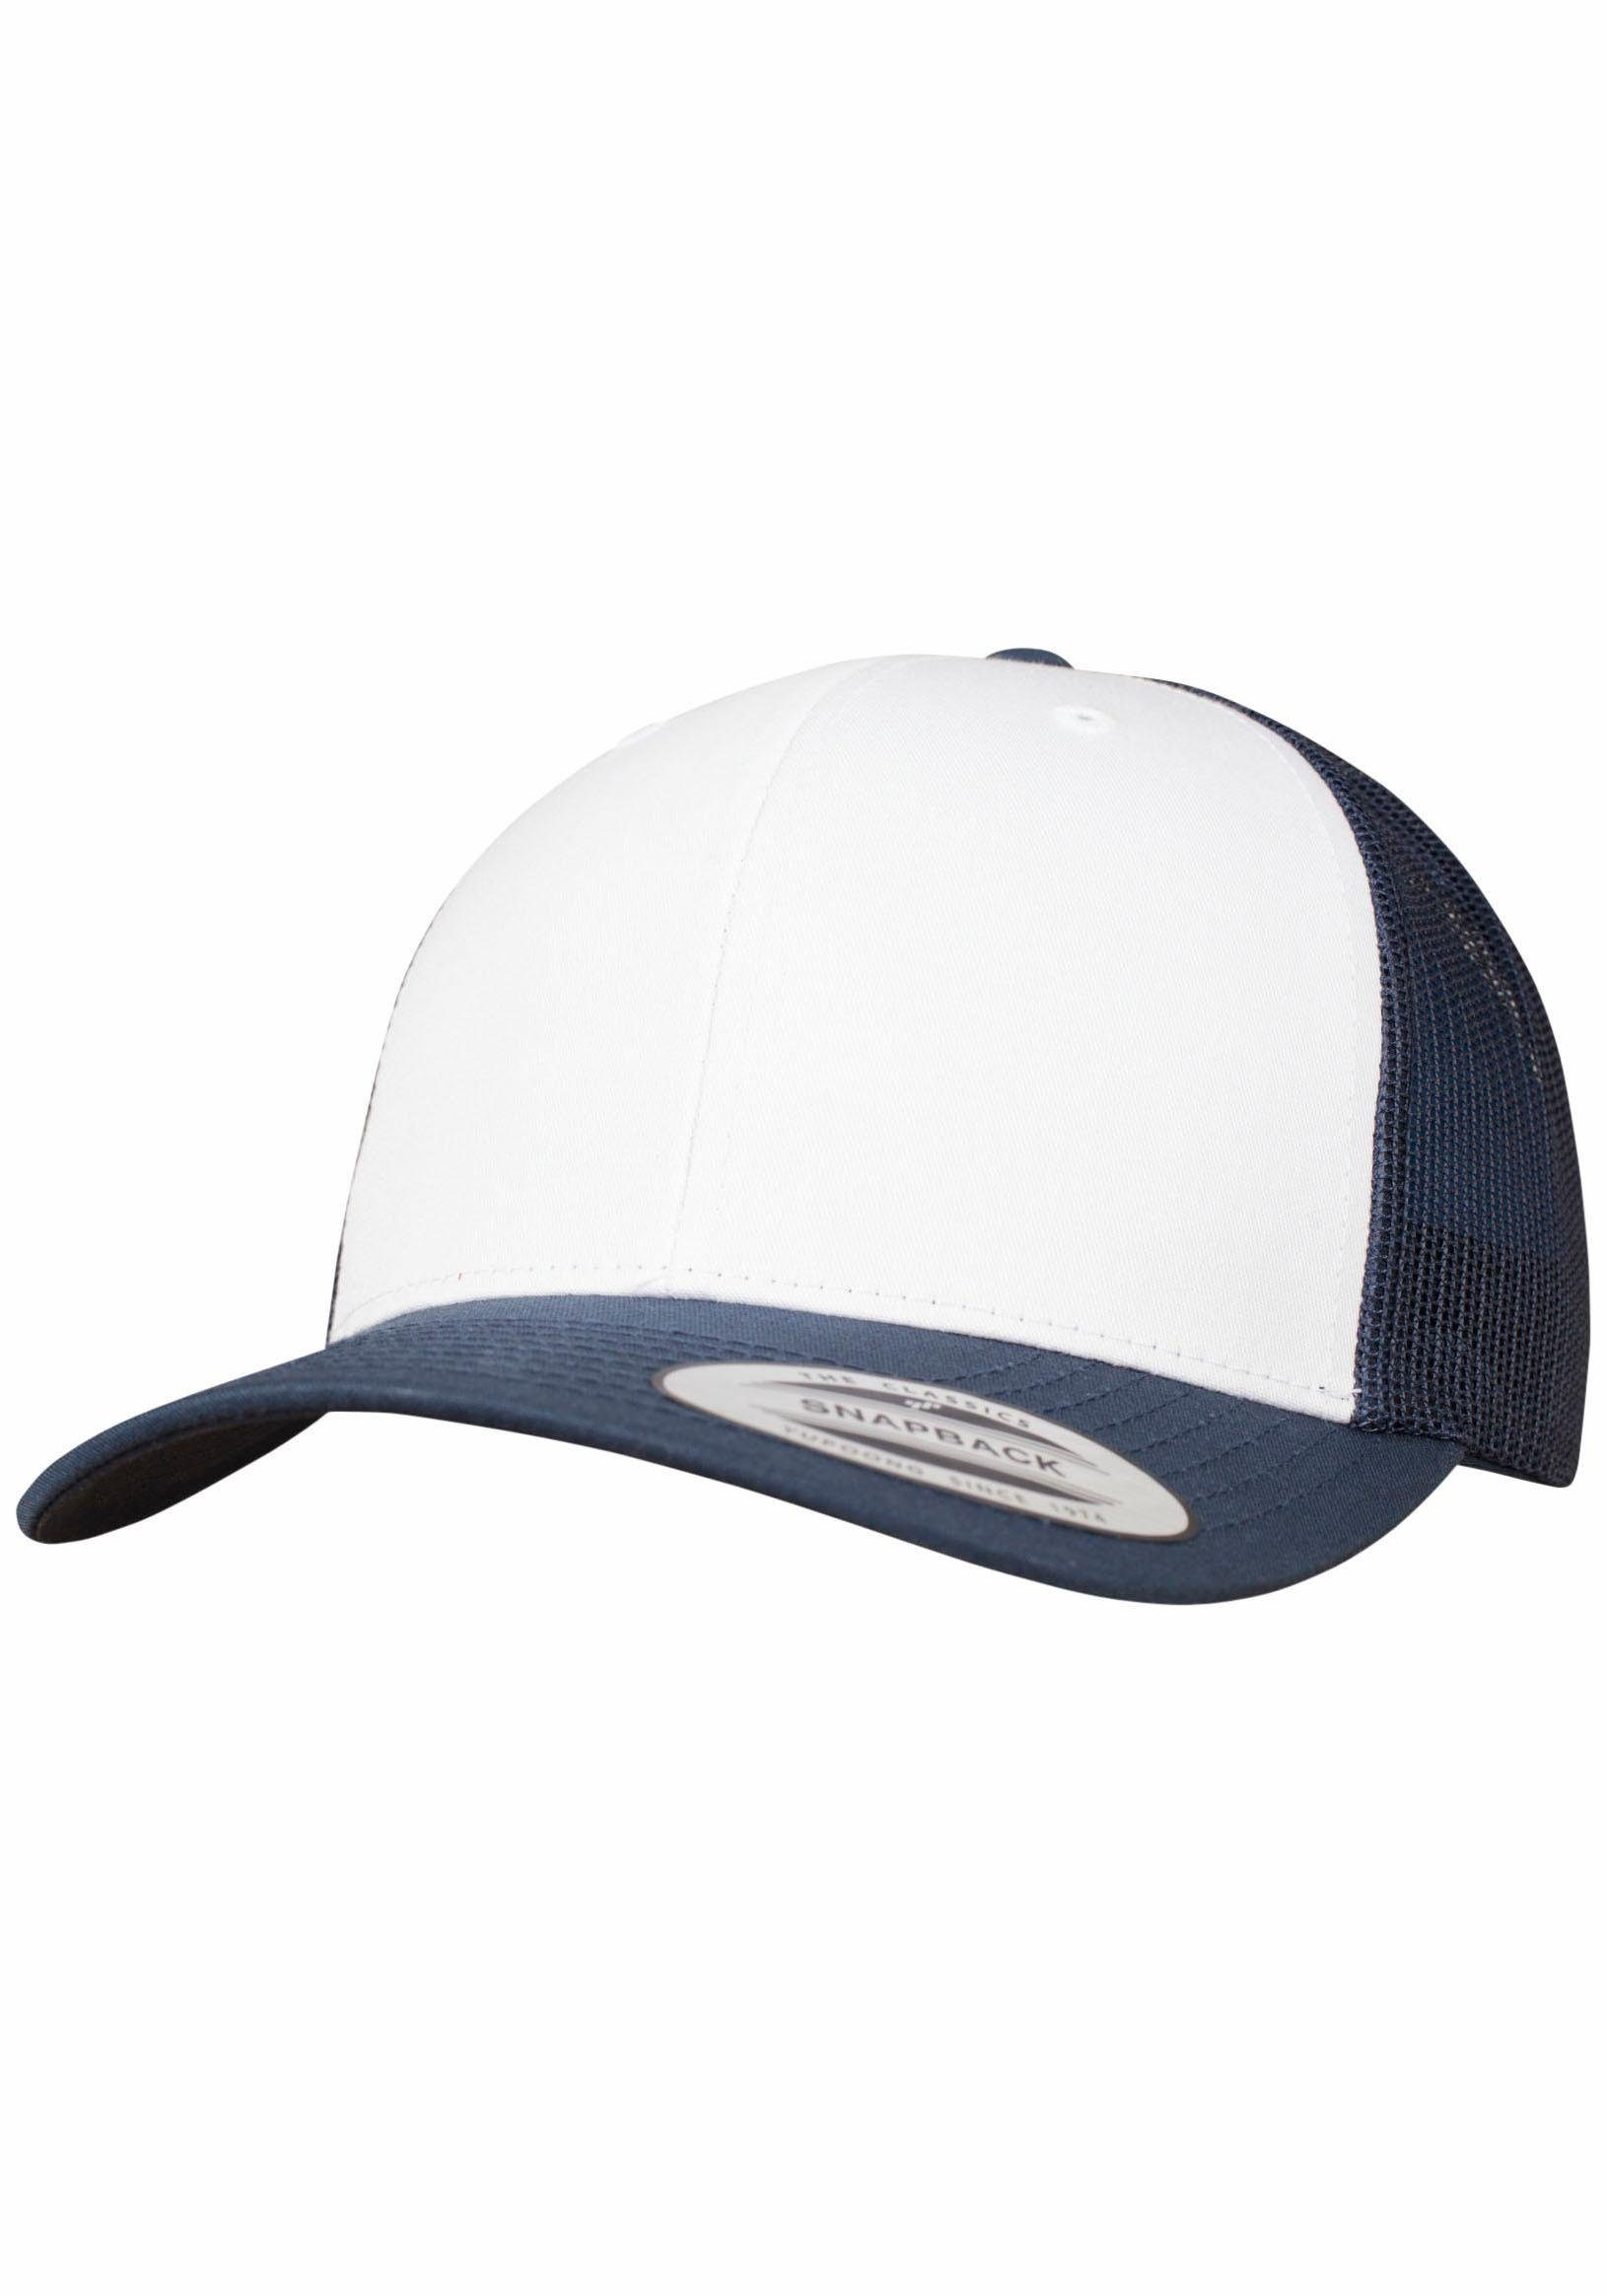 Baseball Cap (1-St) Retro Trucker Colored Front, Snapback Style